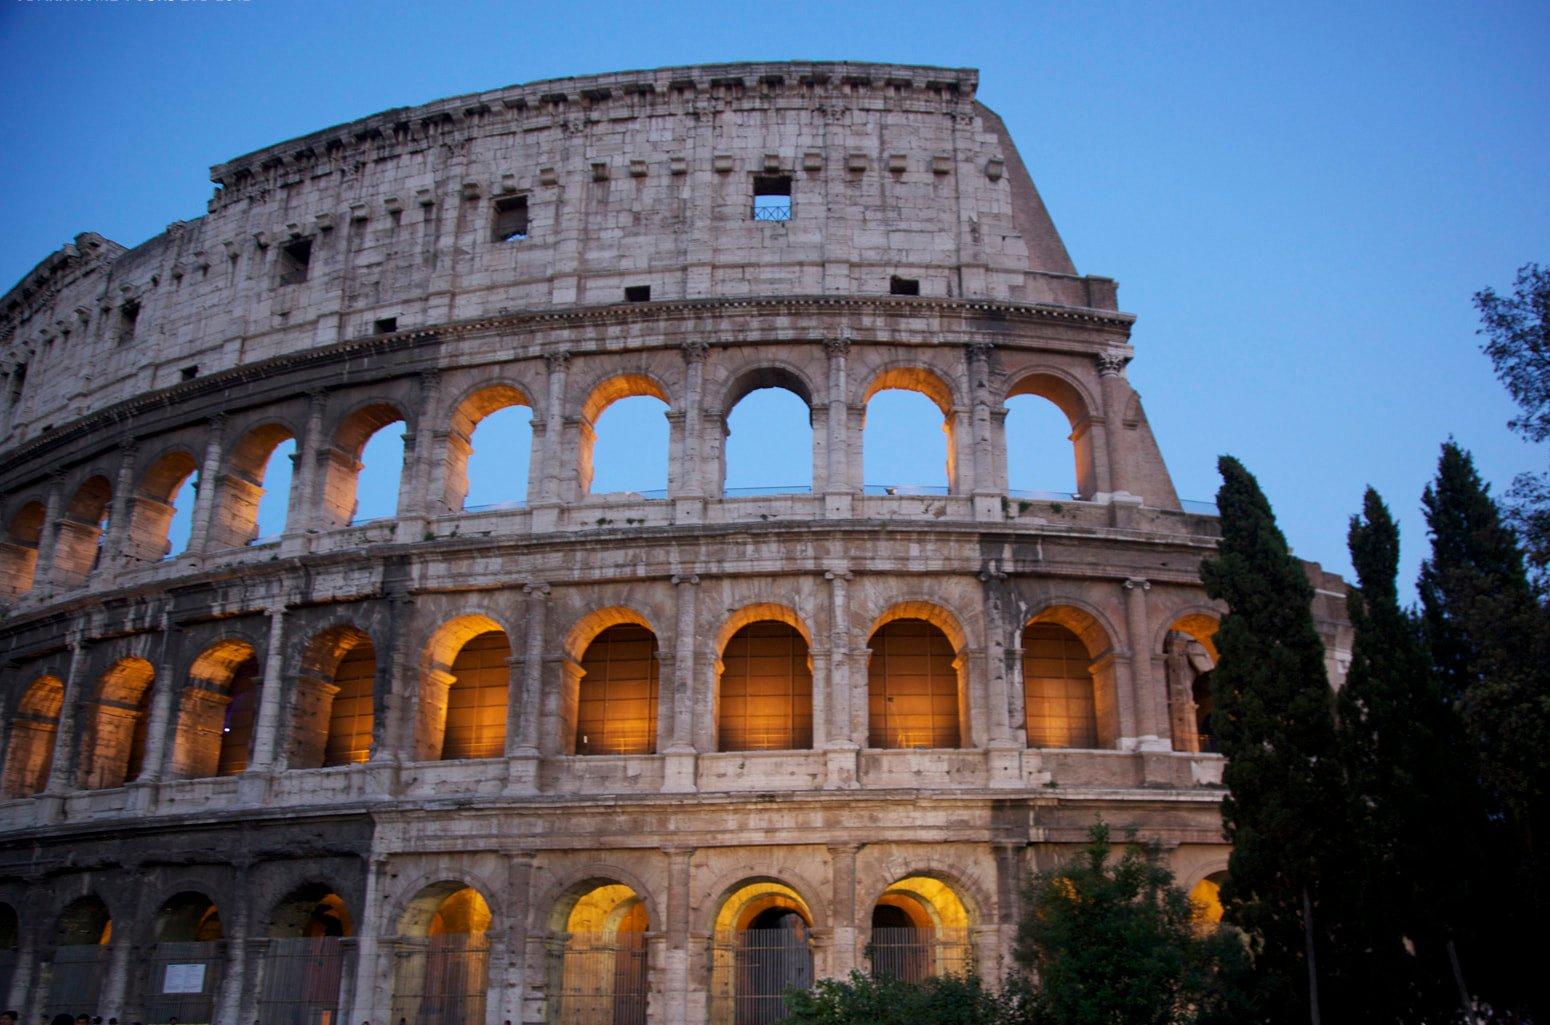 Urban photo of monuments